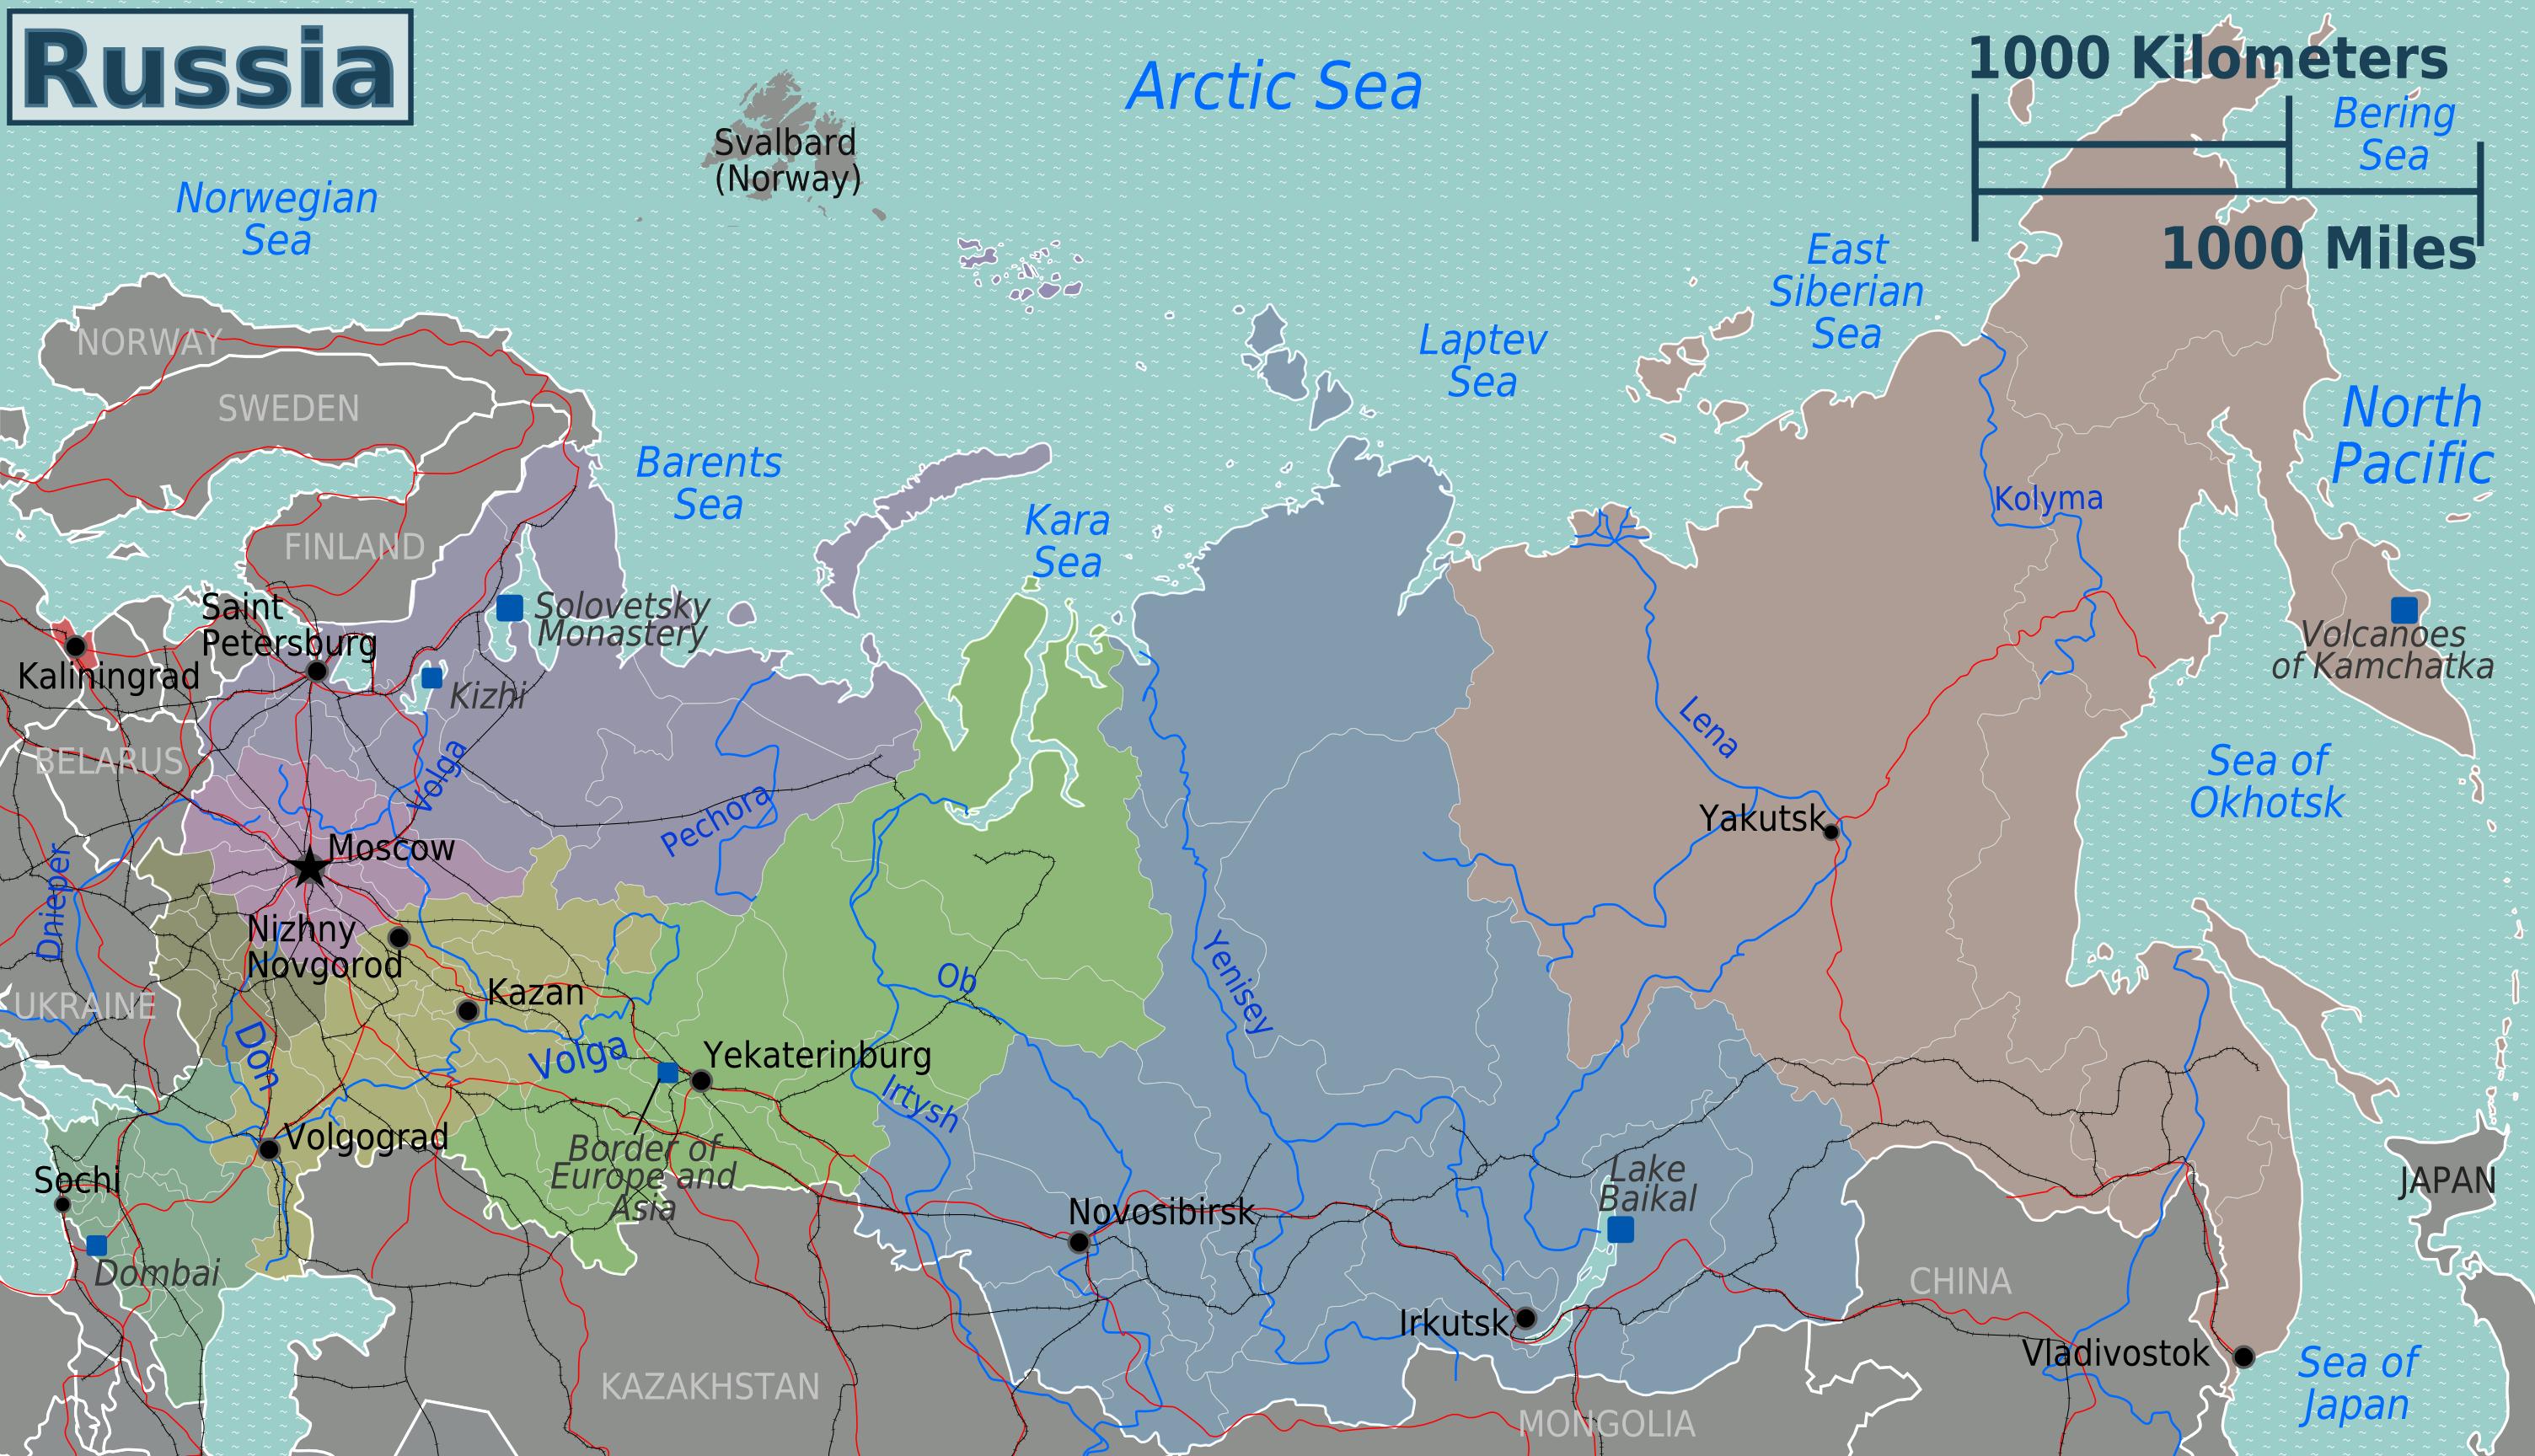 Filerussia regions mapg wikimedia commons filerussia regions mapg publicscrutiny Image collections